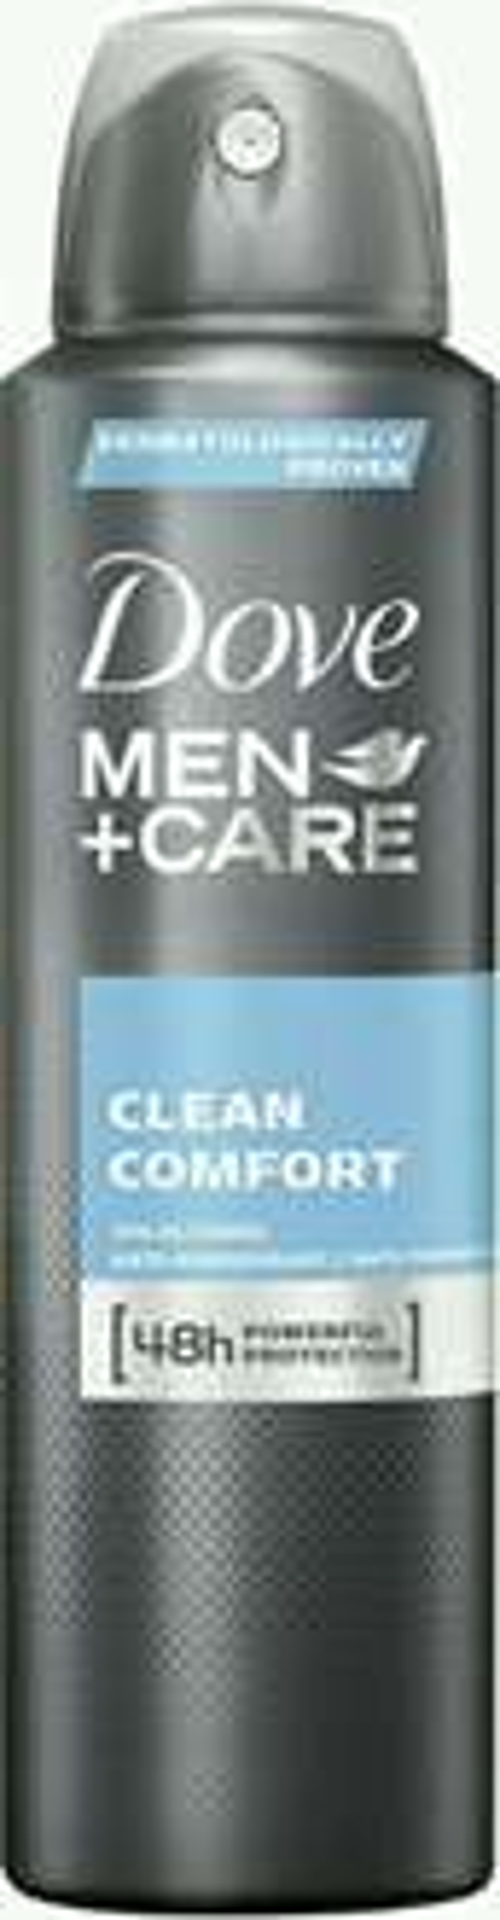 Dove Men+Care Deospray Clean Comfort  Anti-Transpirant, 3er Pack (3 x 150 ml)